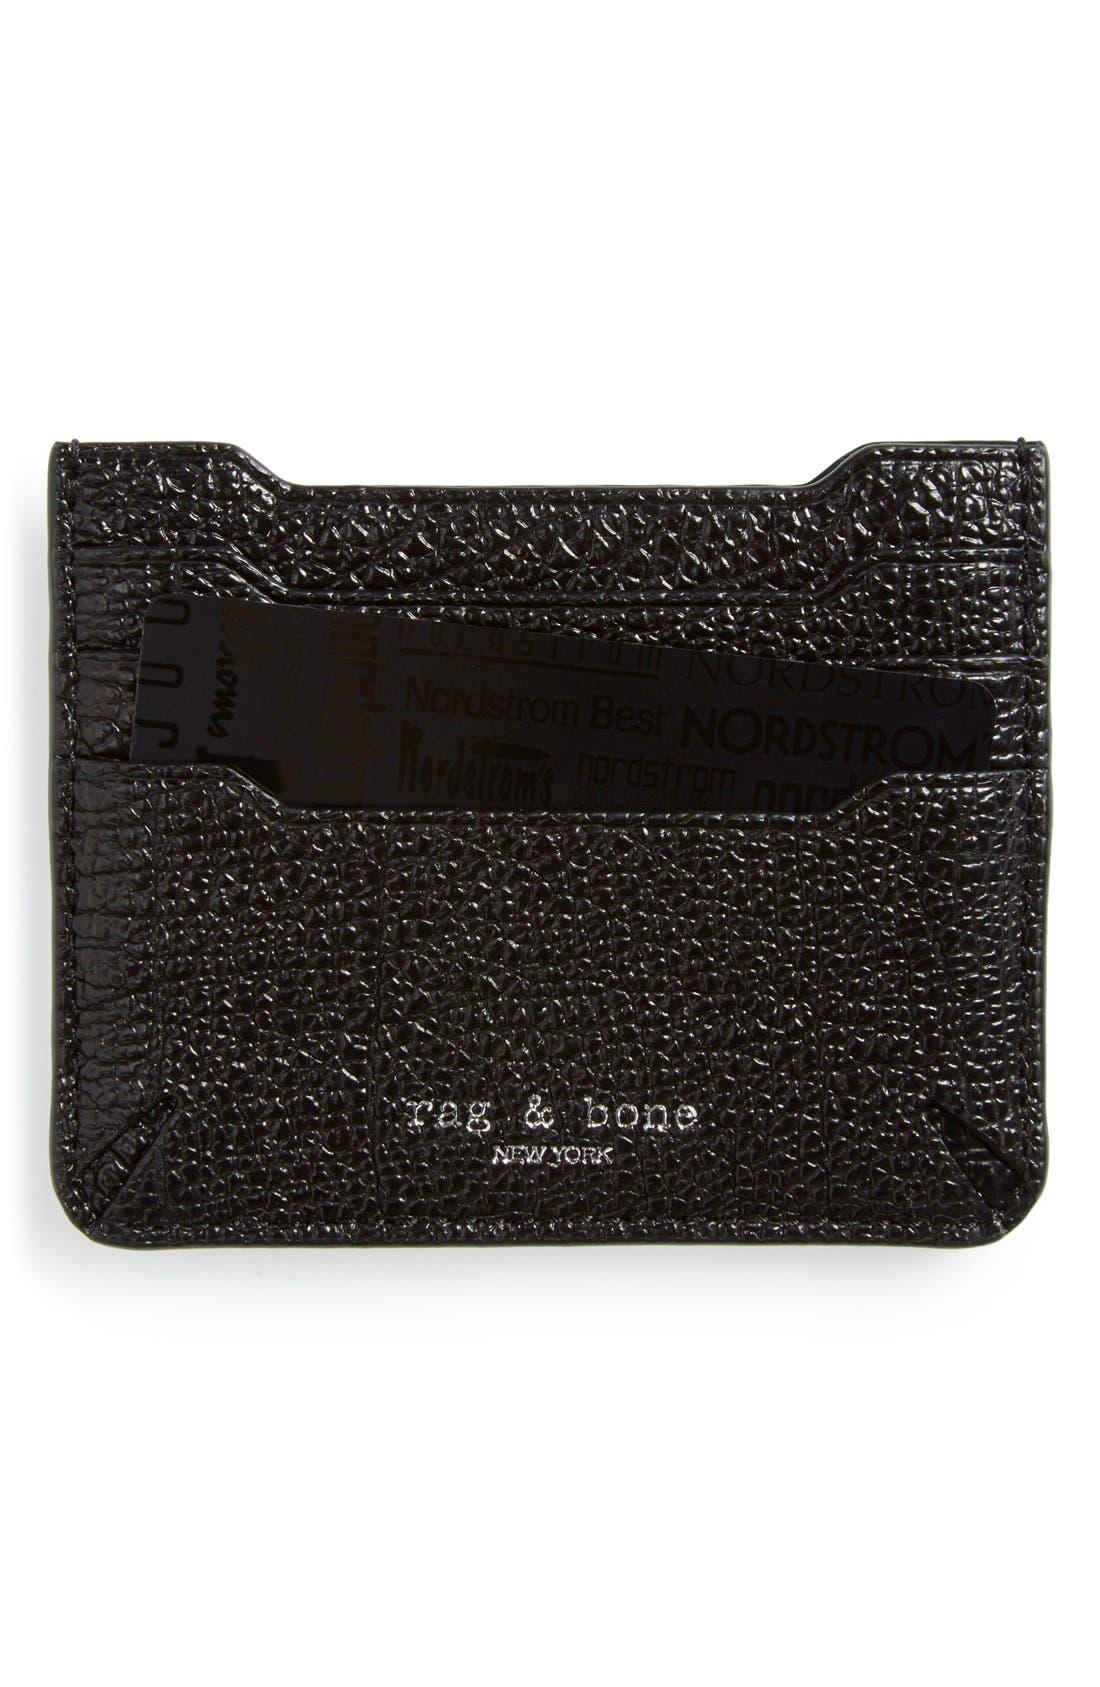 Alternate Image 1 Selected - rag & bone 'Crosby' Crackle Leather Card Case